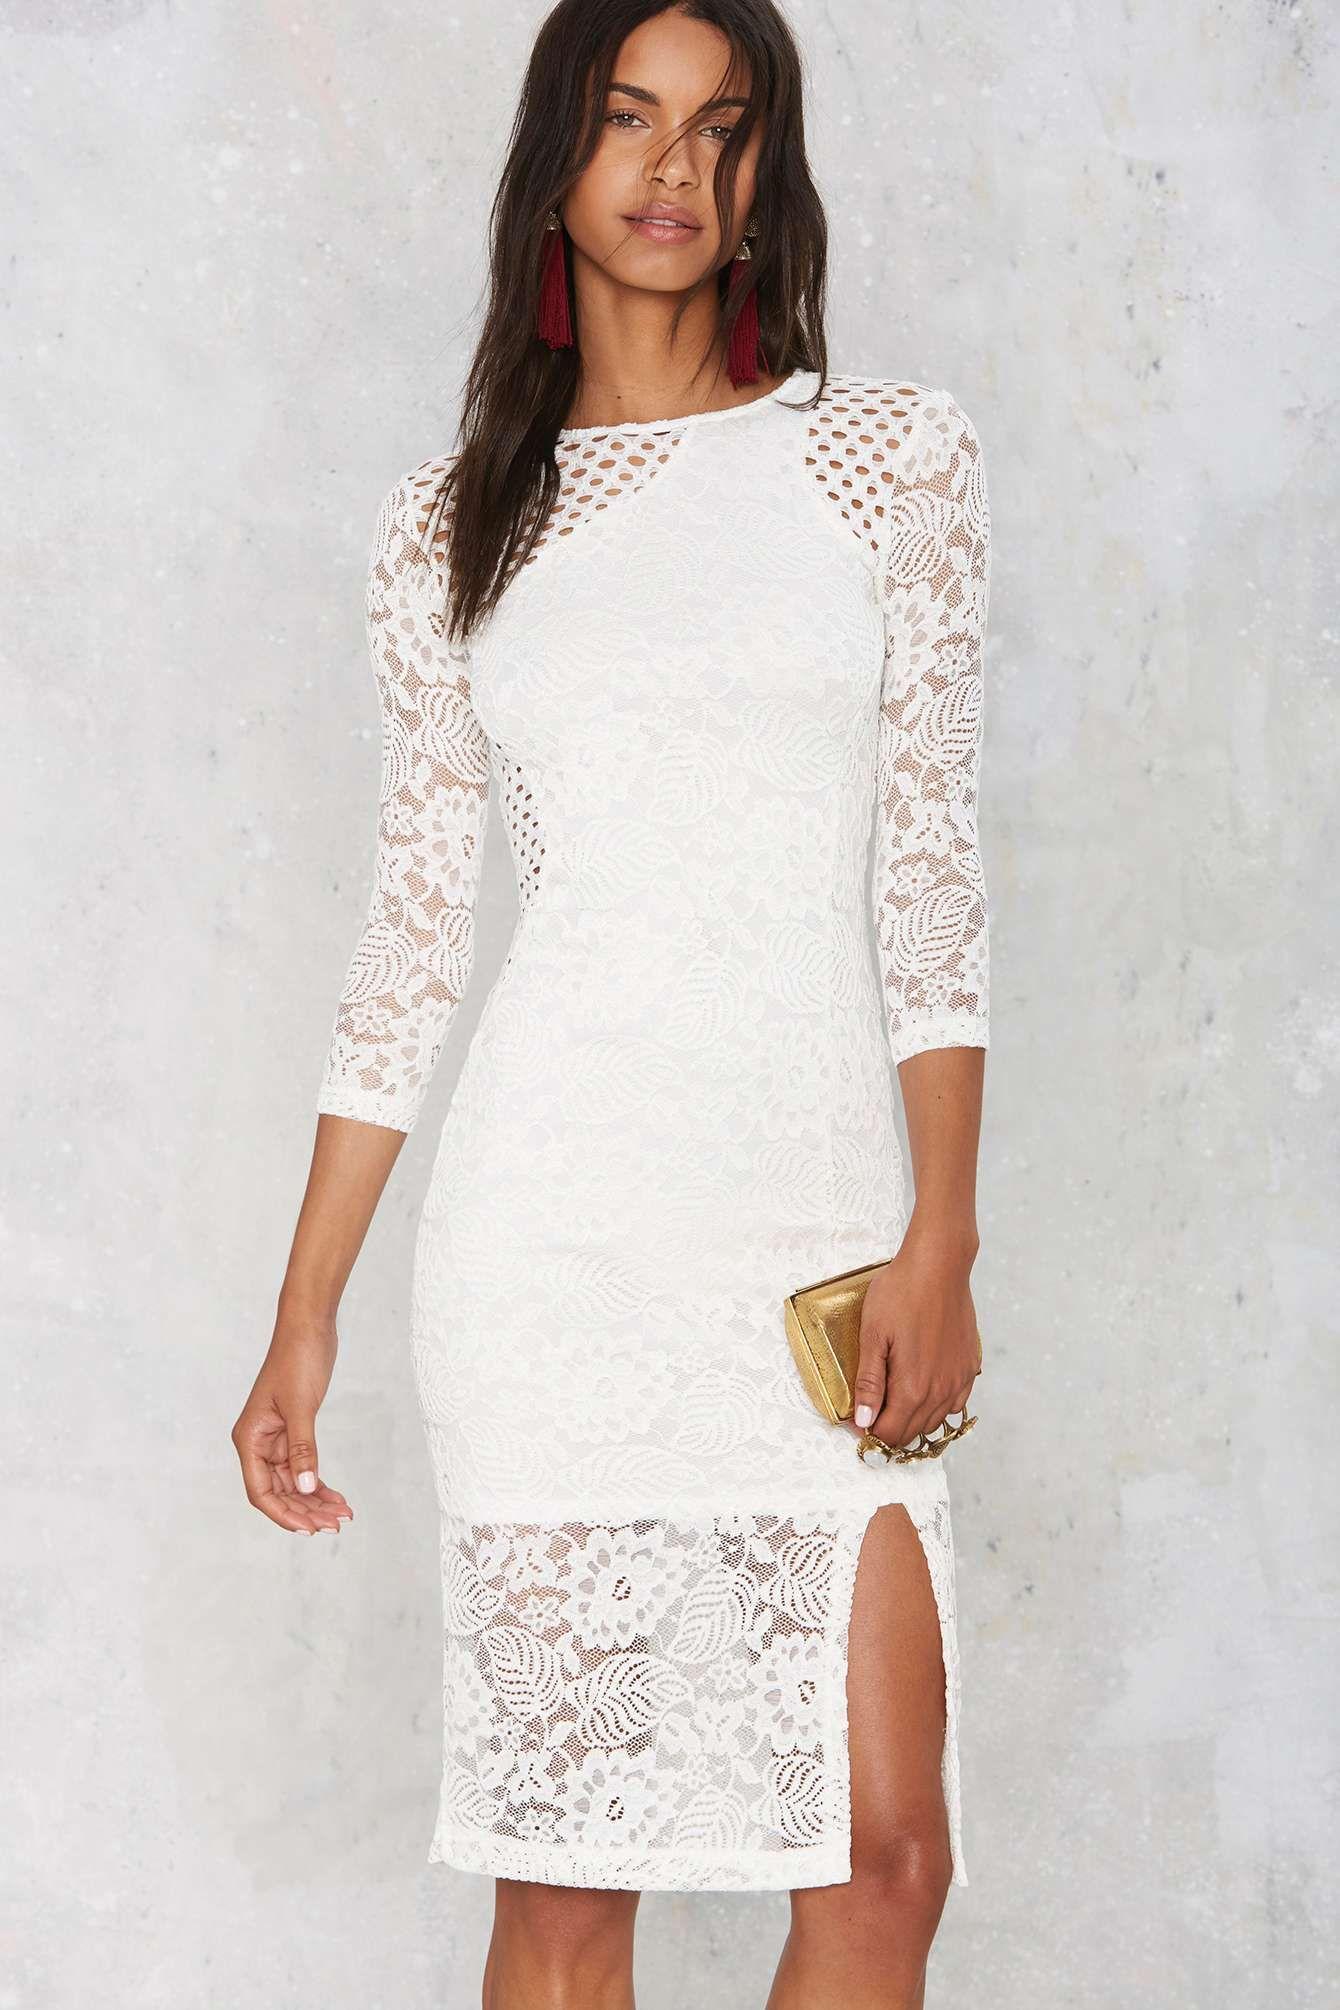 Lace dress vancouver dermatology my fashion dresses pinterest